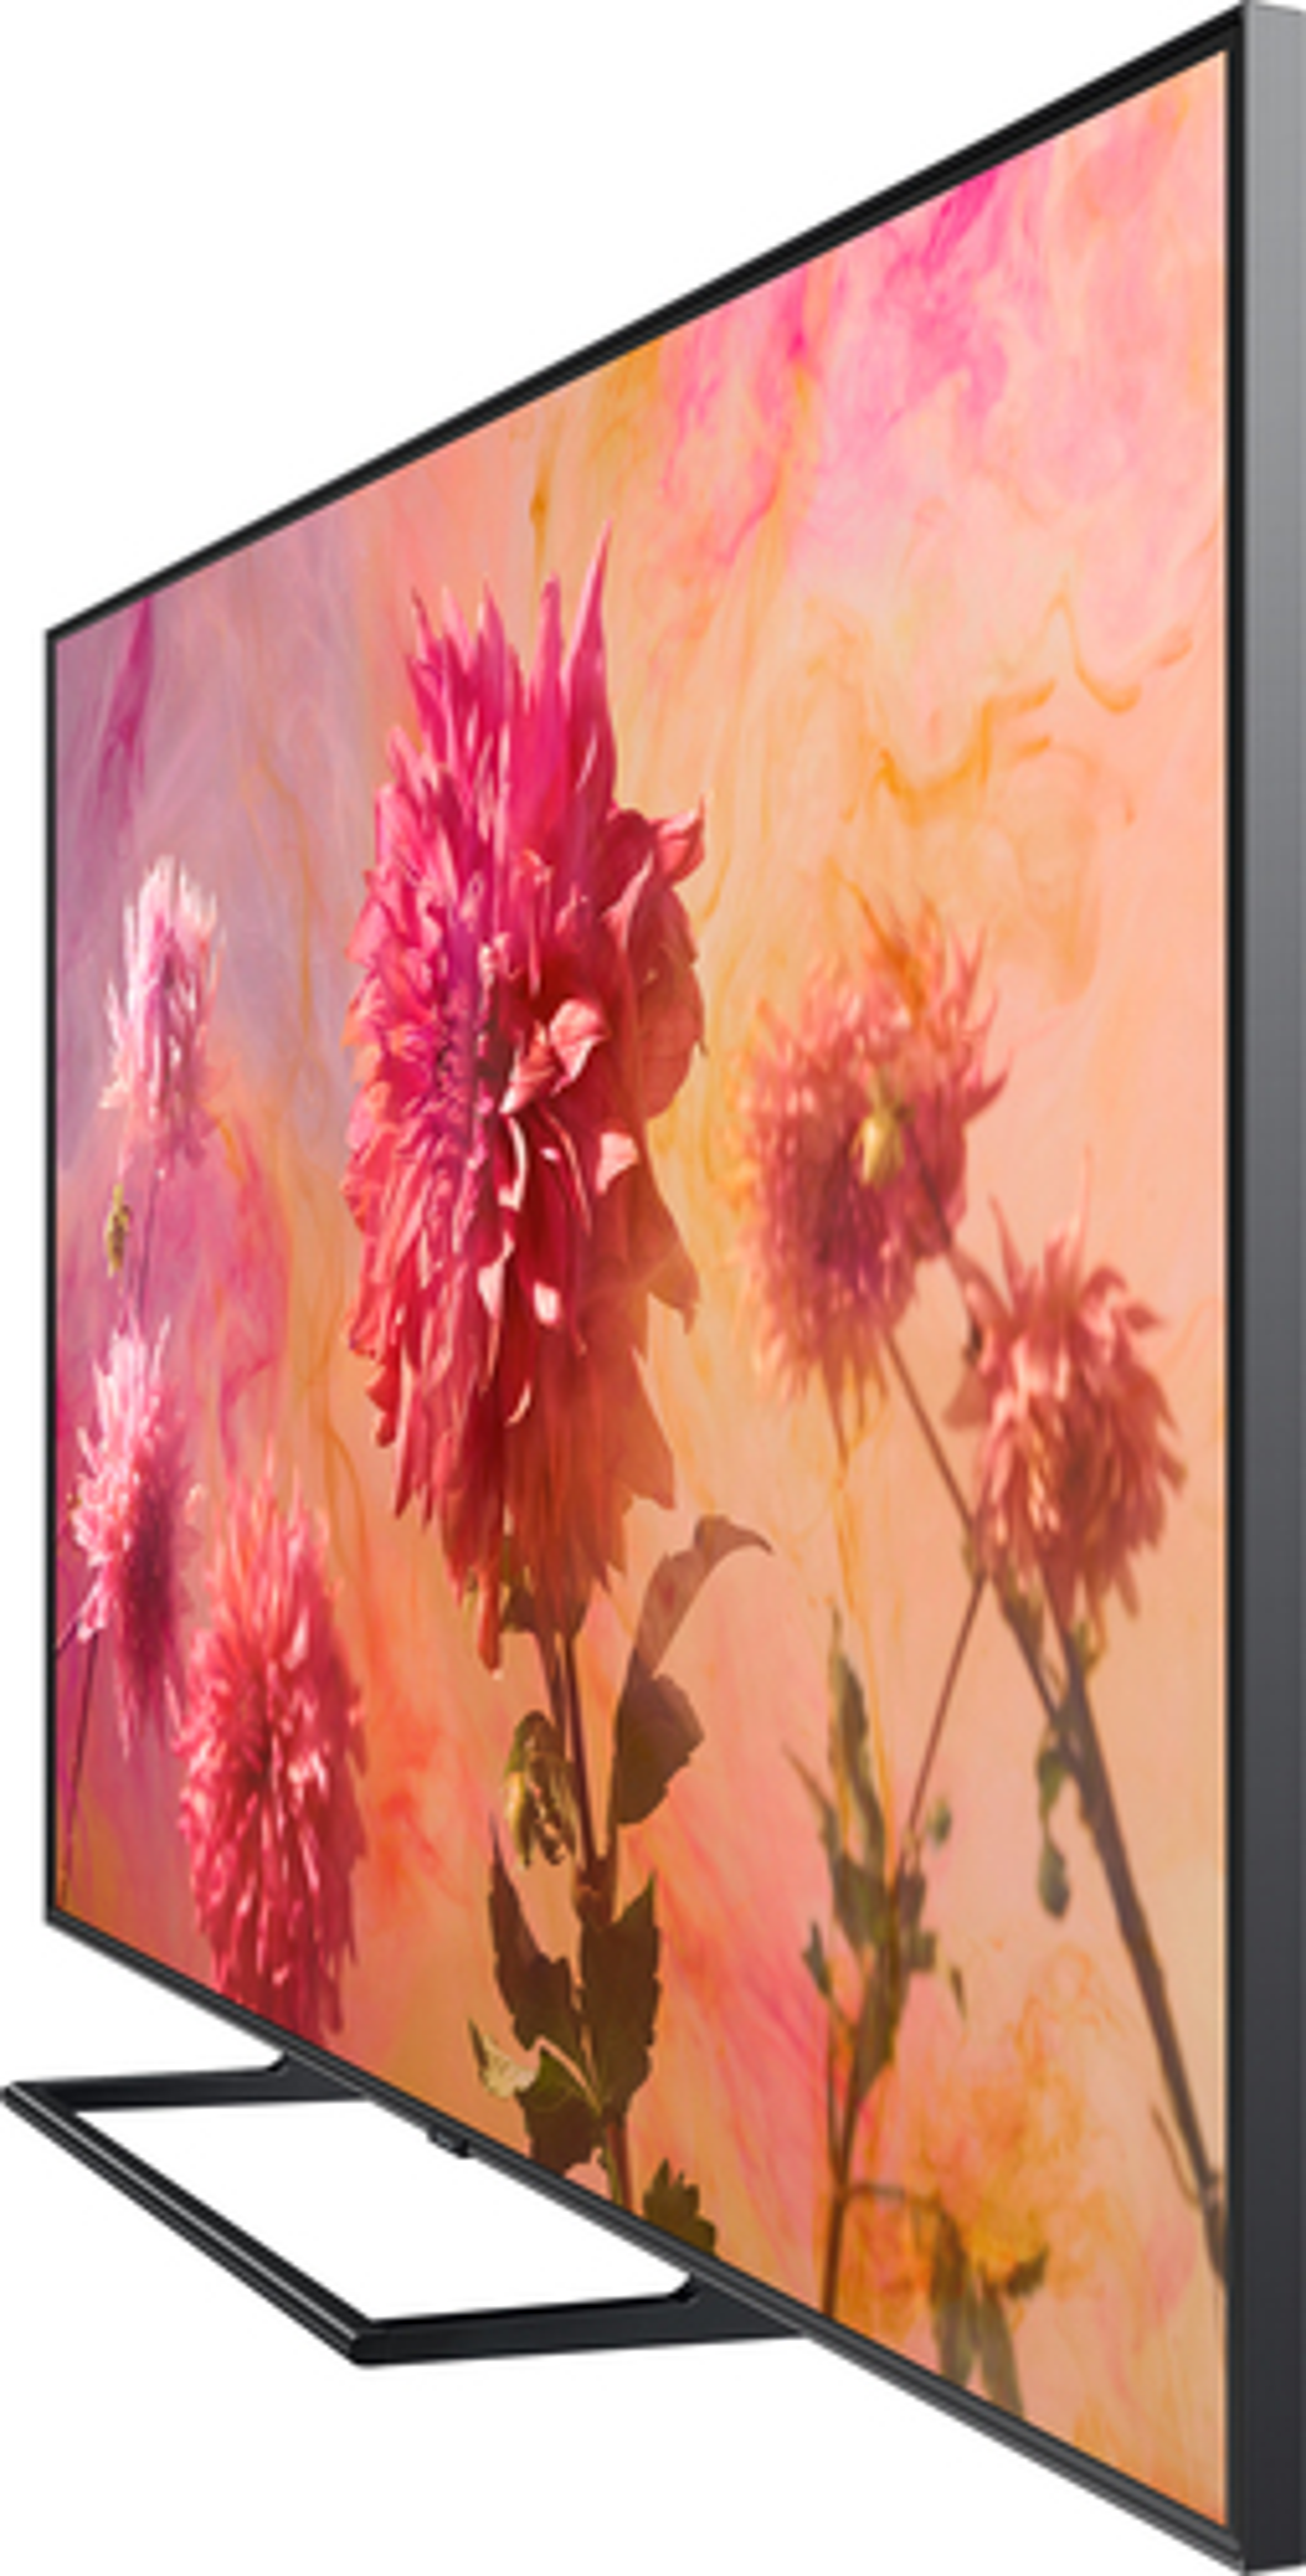 Image 9 for Samsung QN75Q9FNAFXZA